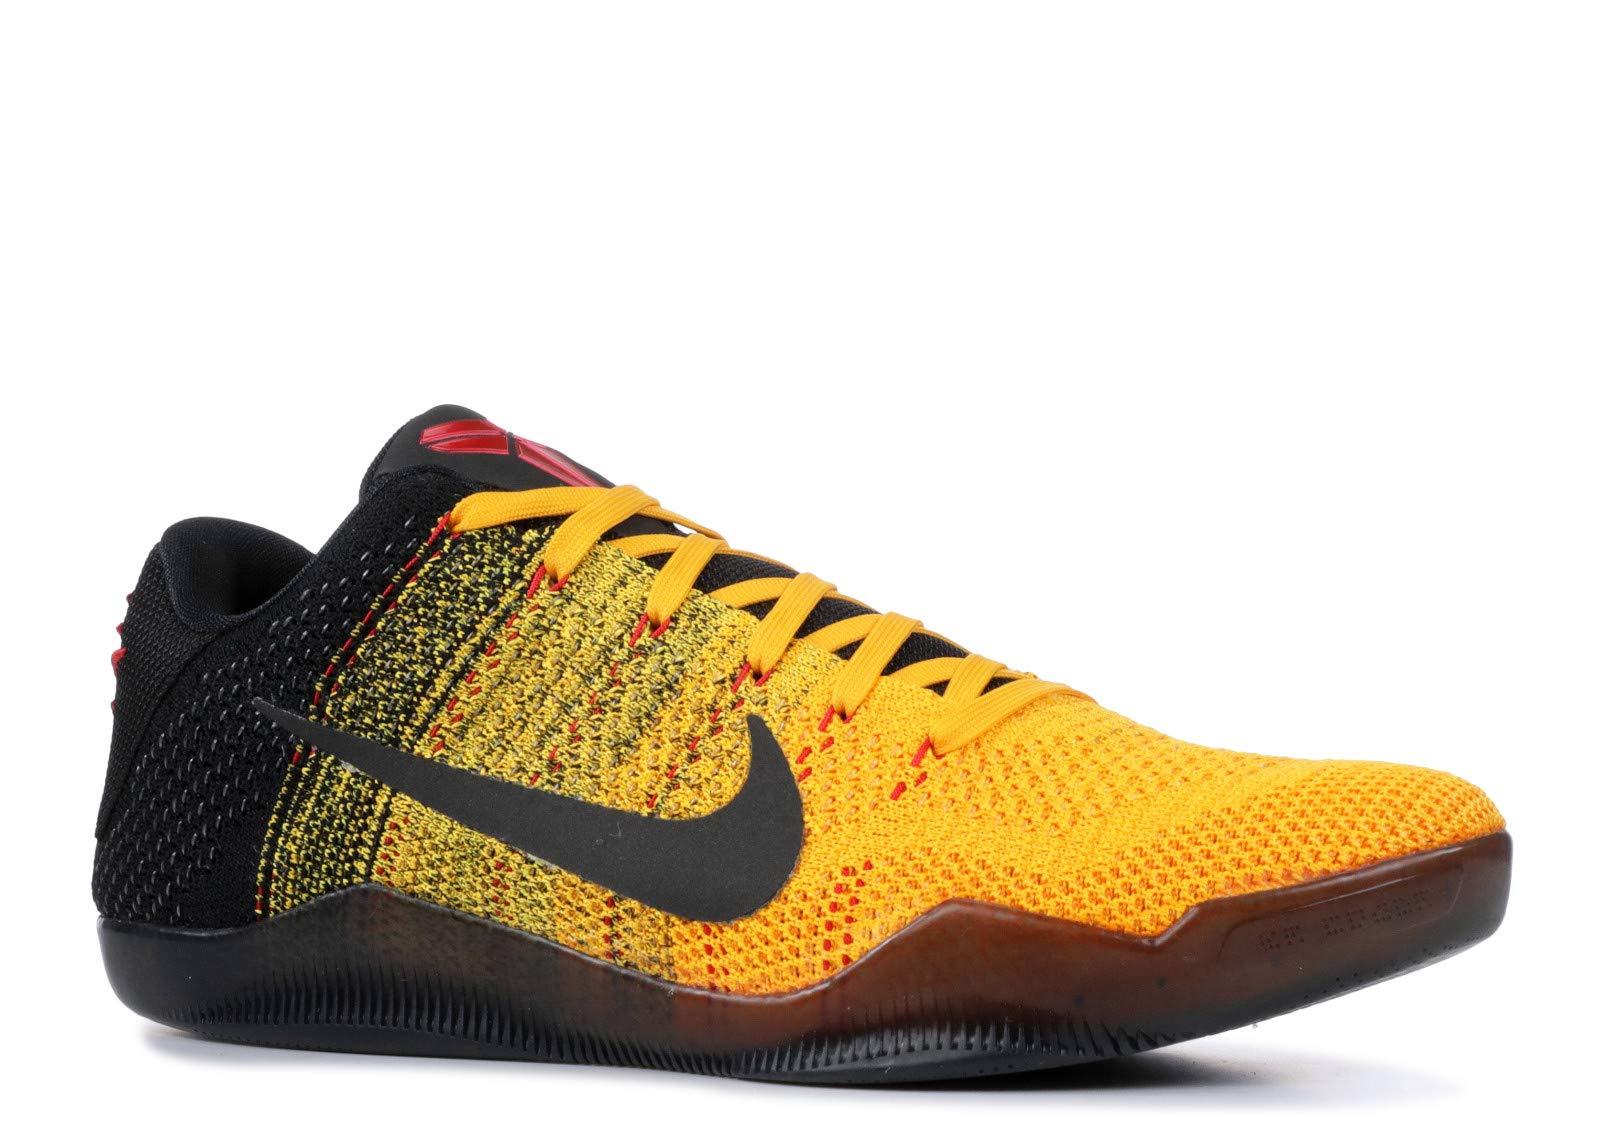 Nike Men's Kobe XI Elite Low, BRUCE LEE